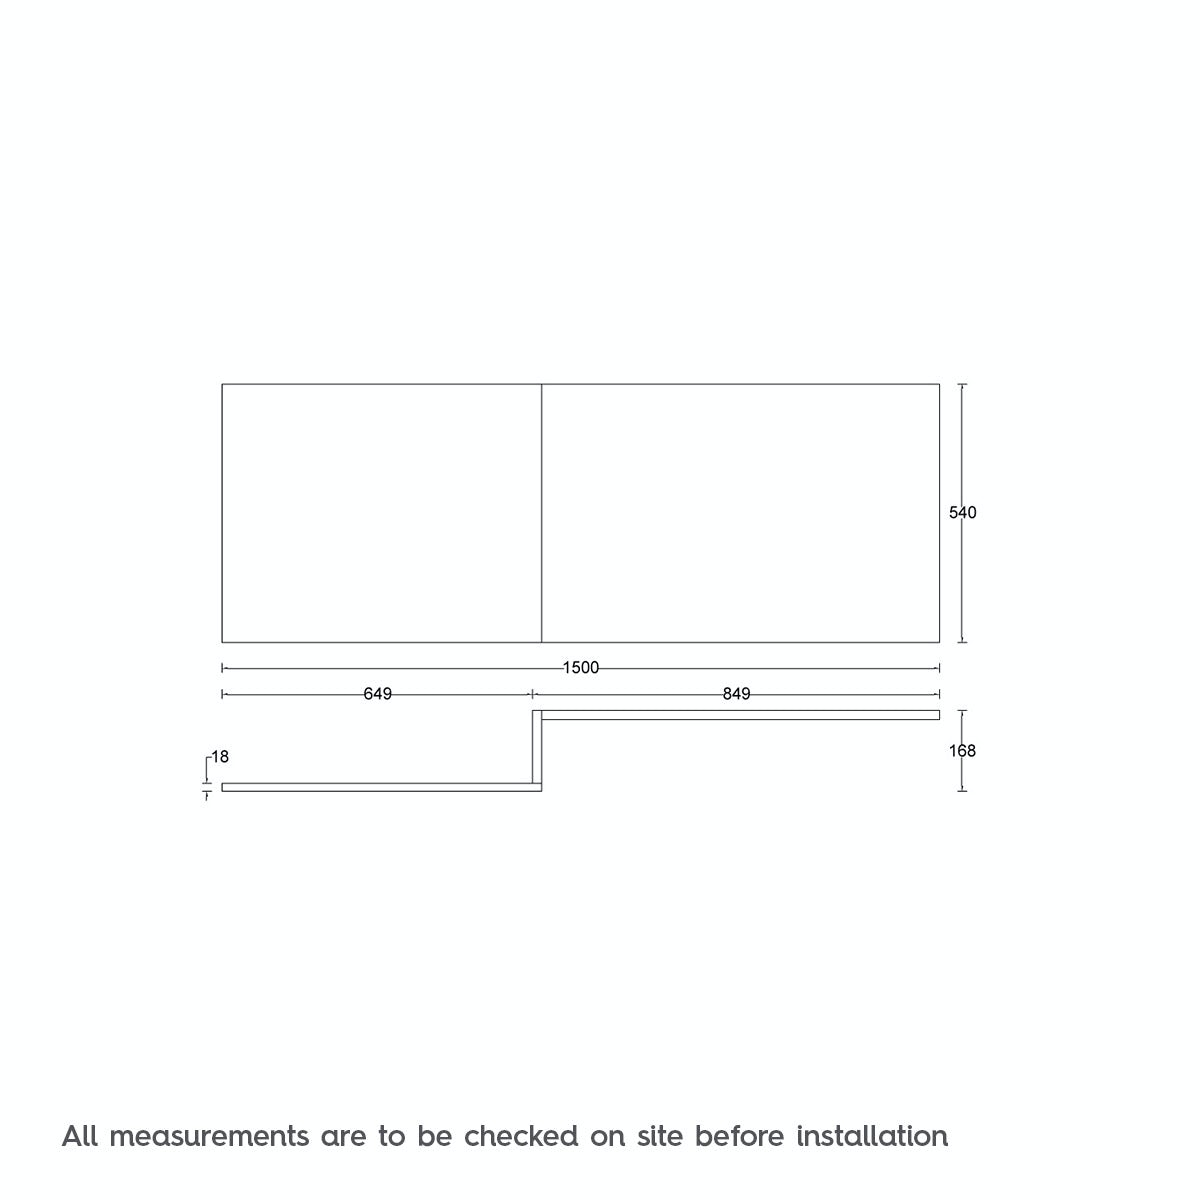 Dimensions for L shaped shower bath wooden front panel Drift essen 1500mm